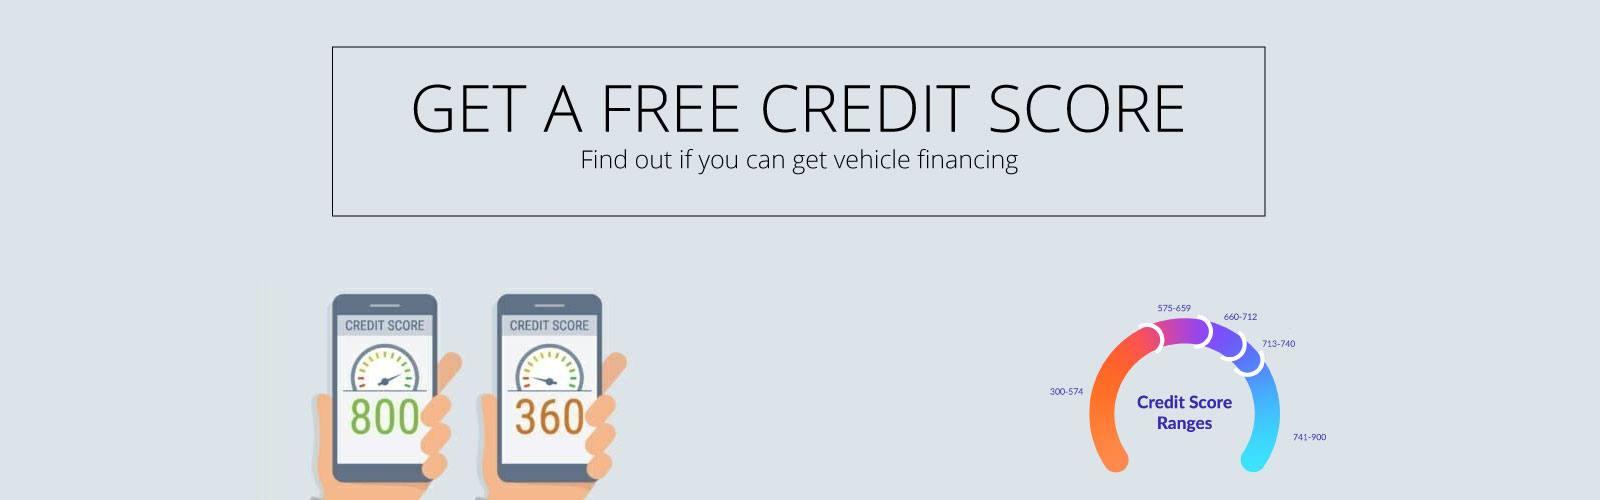 get a free credit score